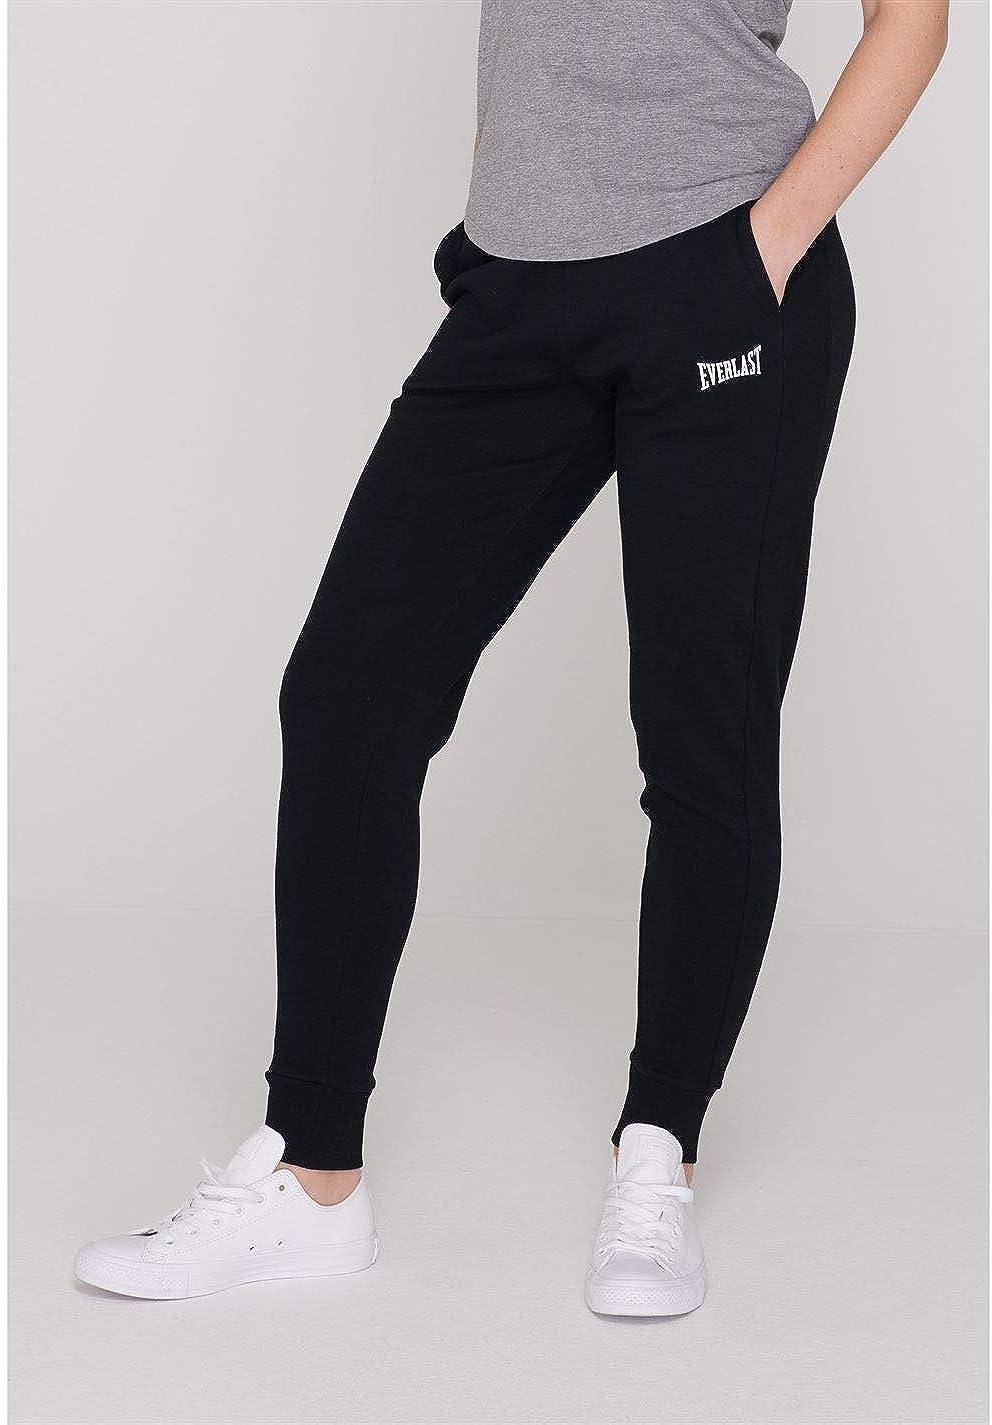 Femme EVERLAST pantalon de jogging jersey léger NEUF